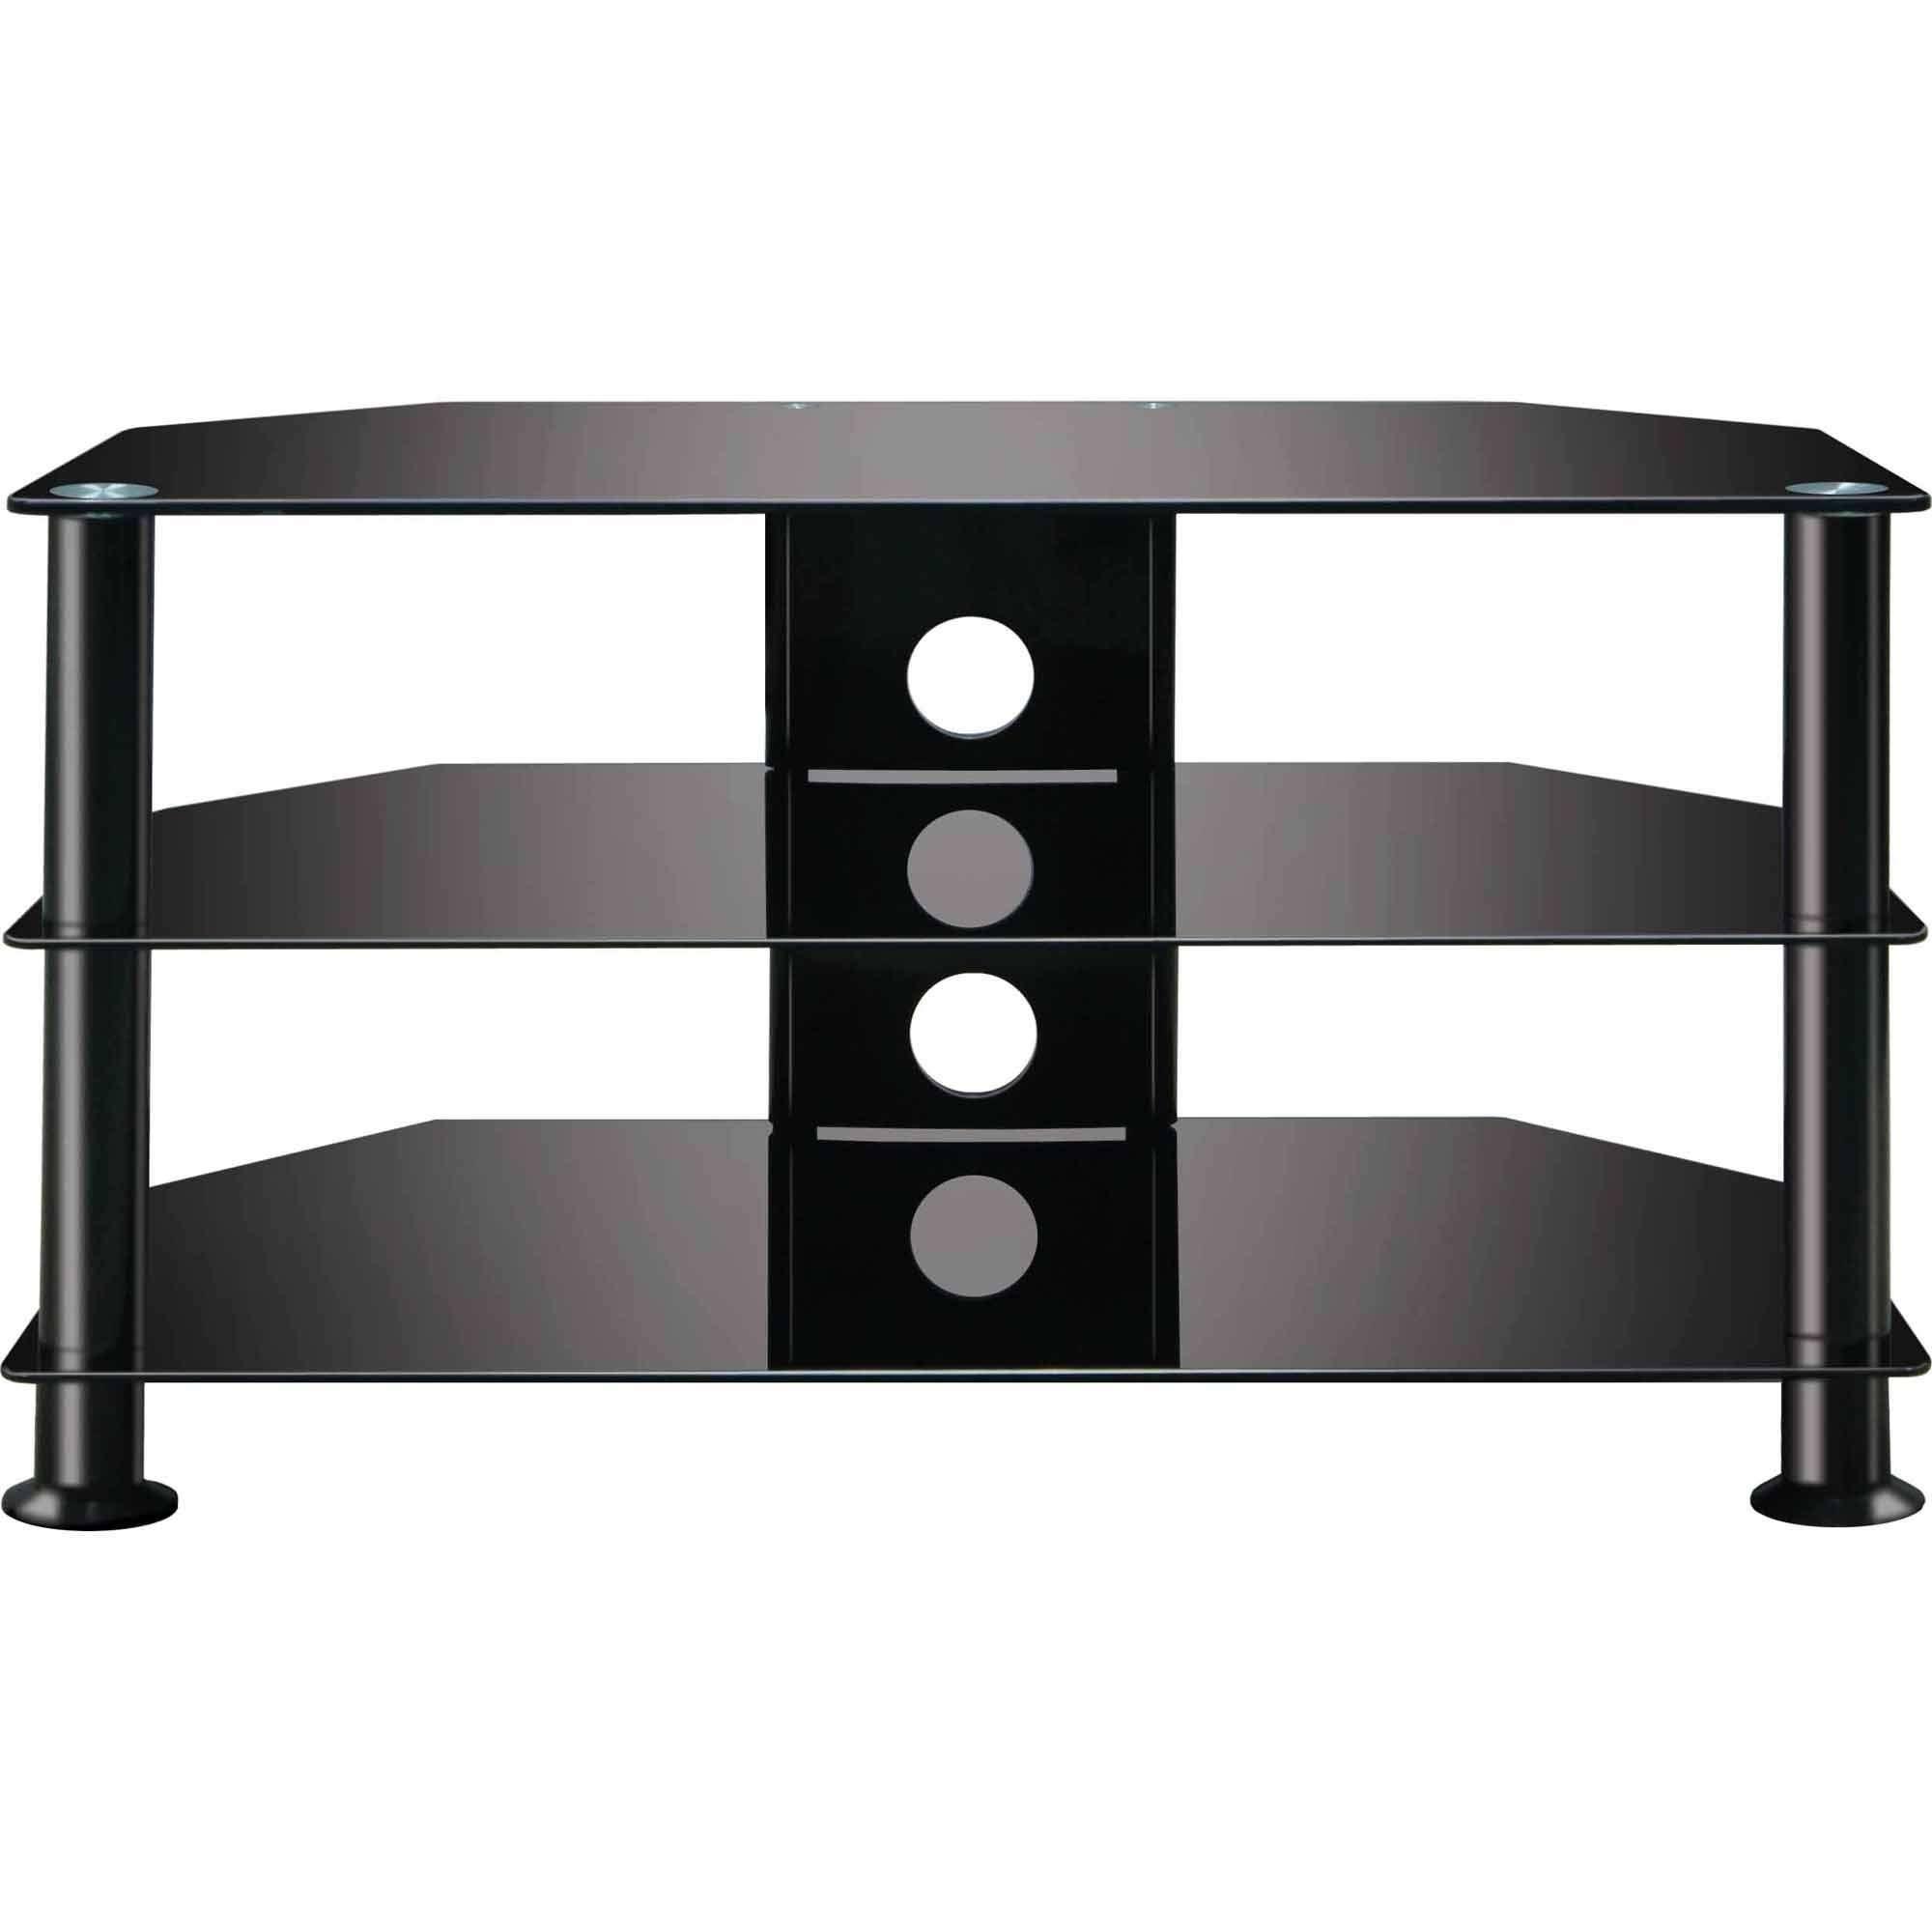 Tv : Amazing Vizio 24 Inch Tv Stands Sculpture Of Tall Corner Tv Inside Vizio 24 Inch Tv Stands (View 11 of 15)